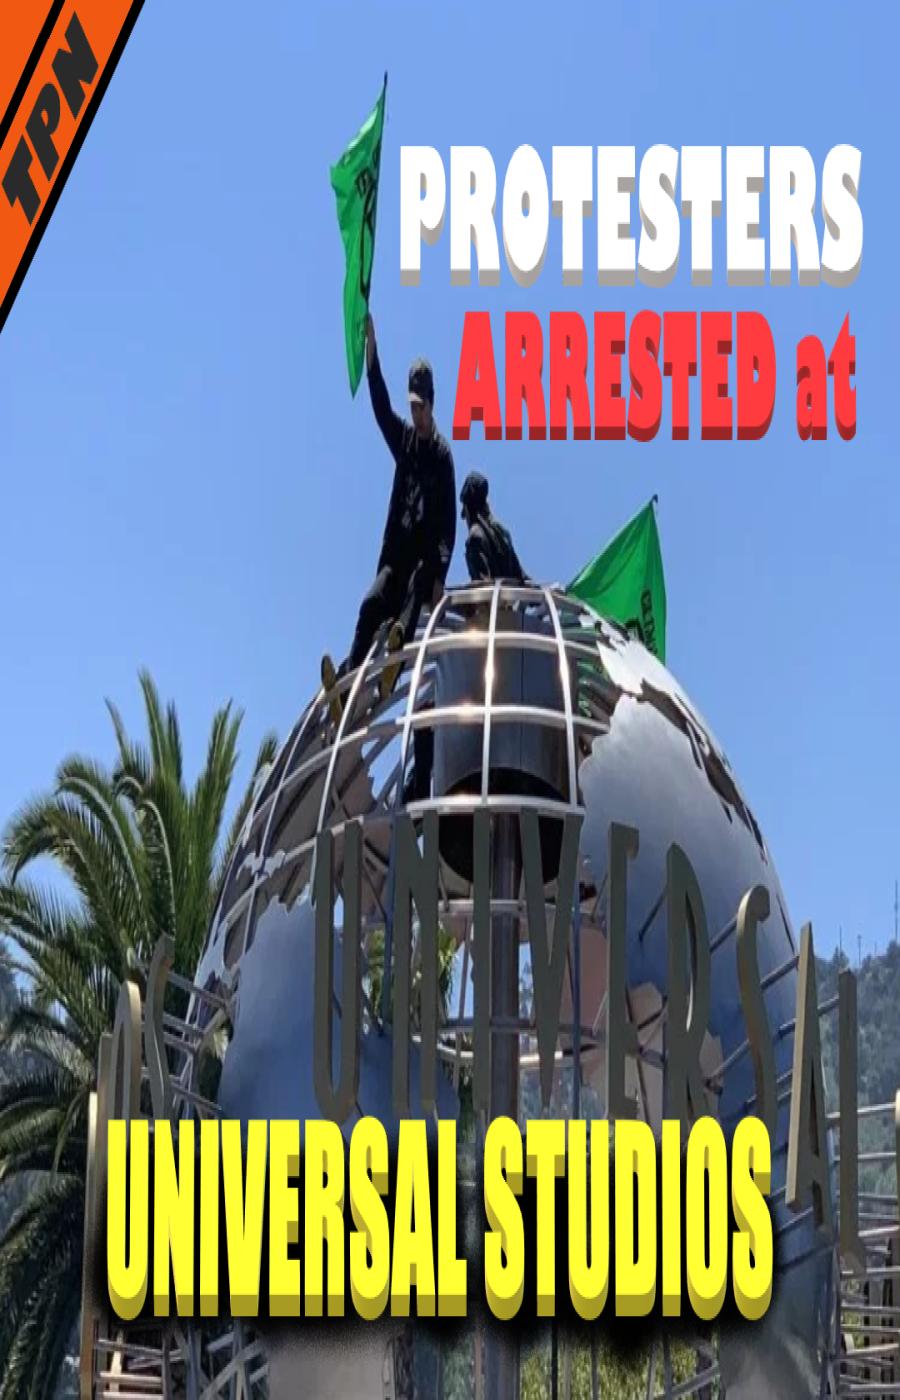 Protesters Arrested At Universal Studios Universal Studios Universal Studios Theme Park Universal Studios Orlando